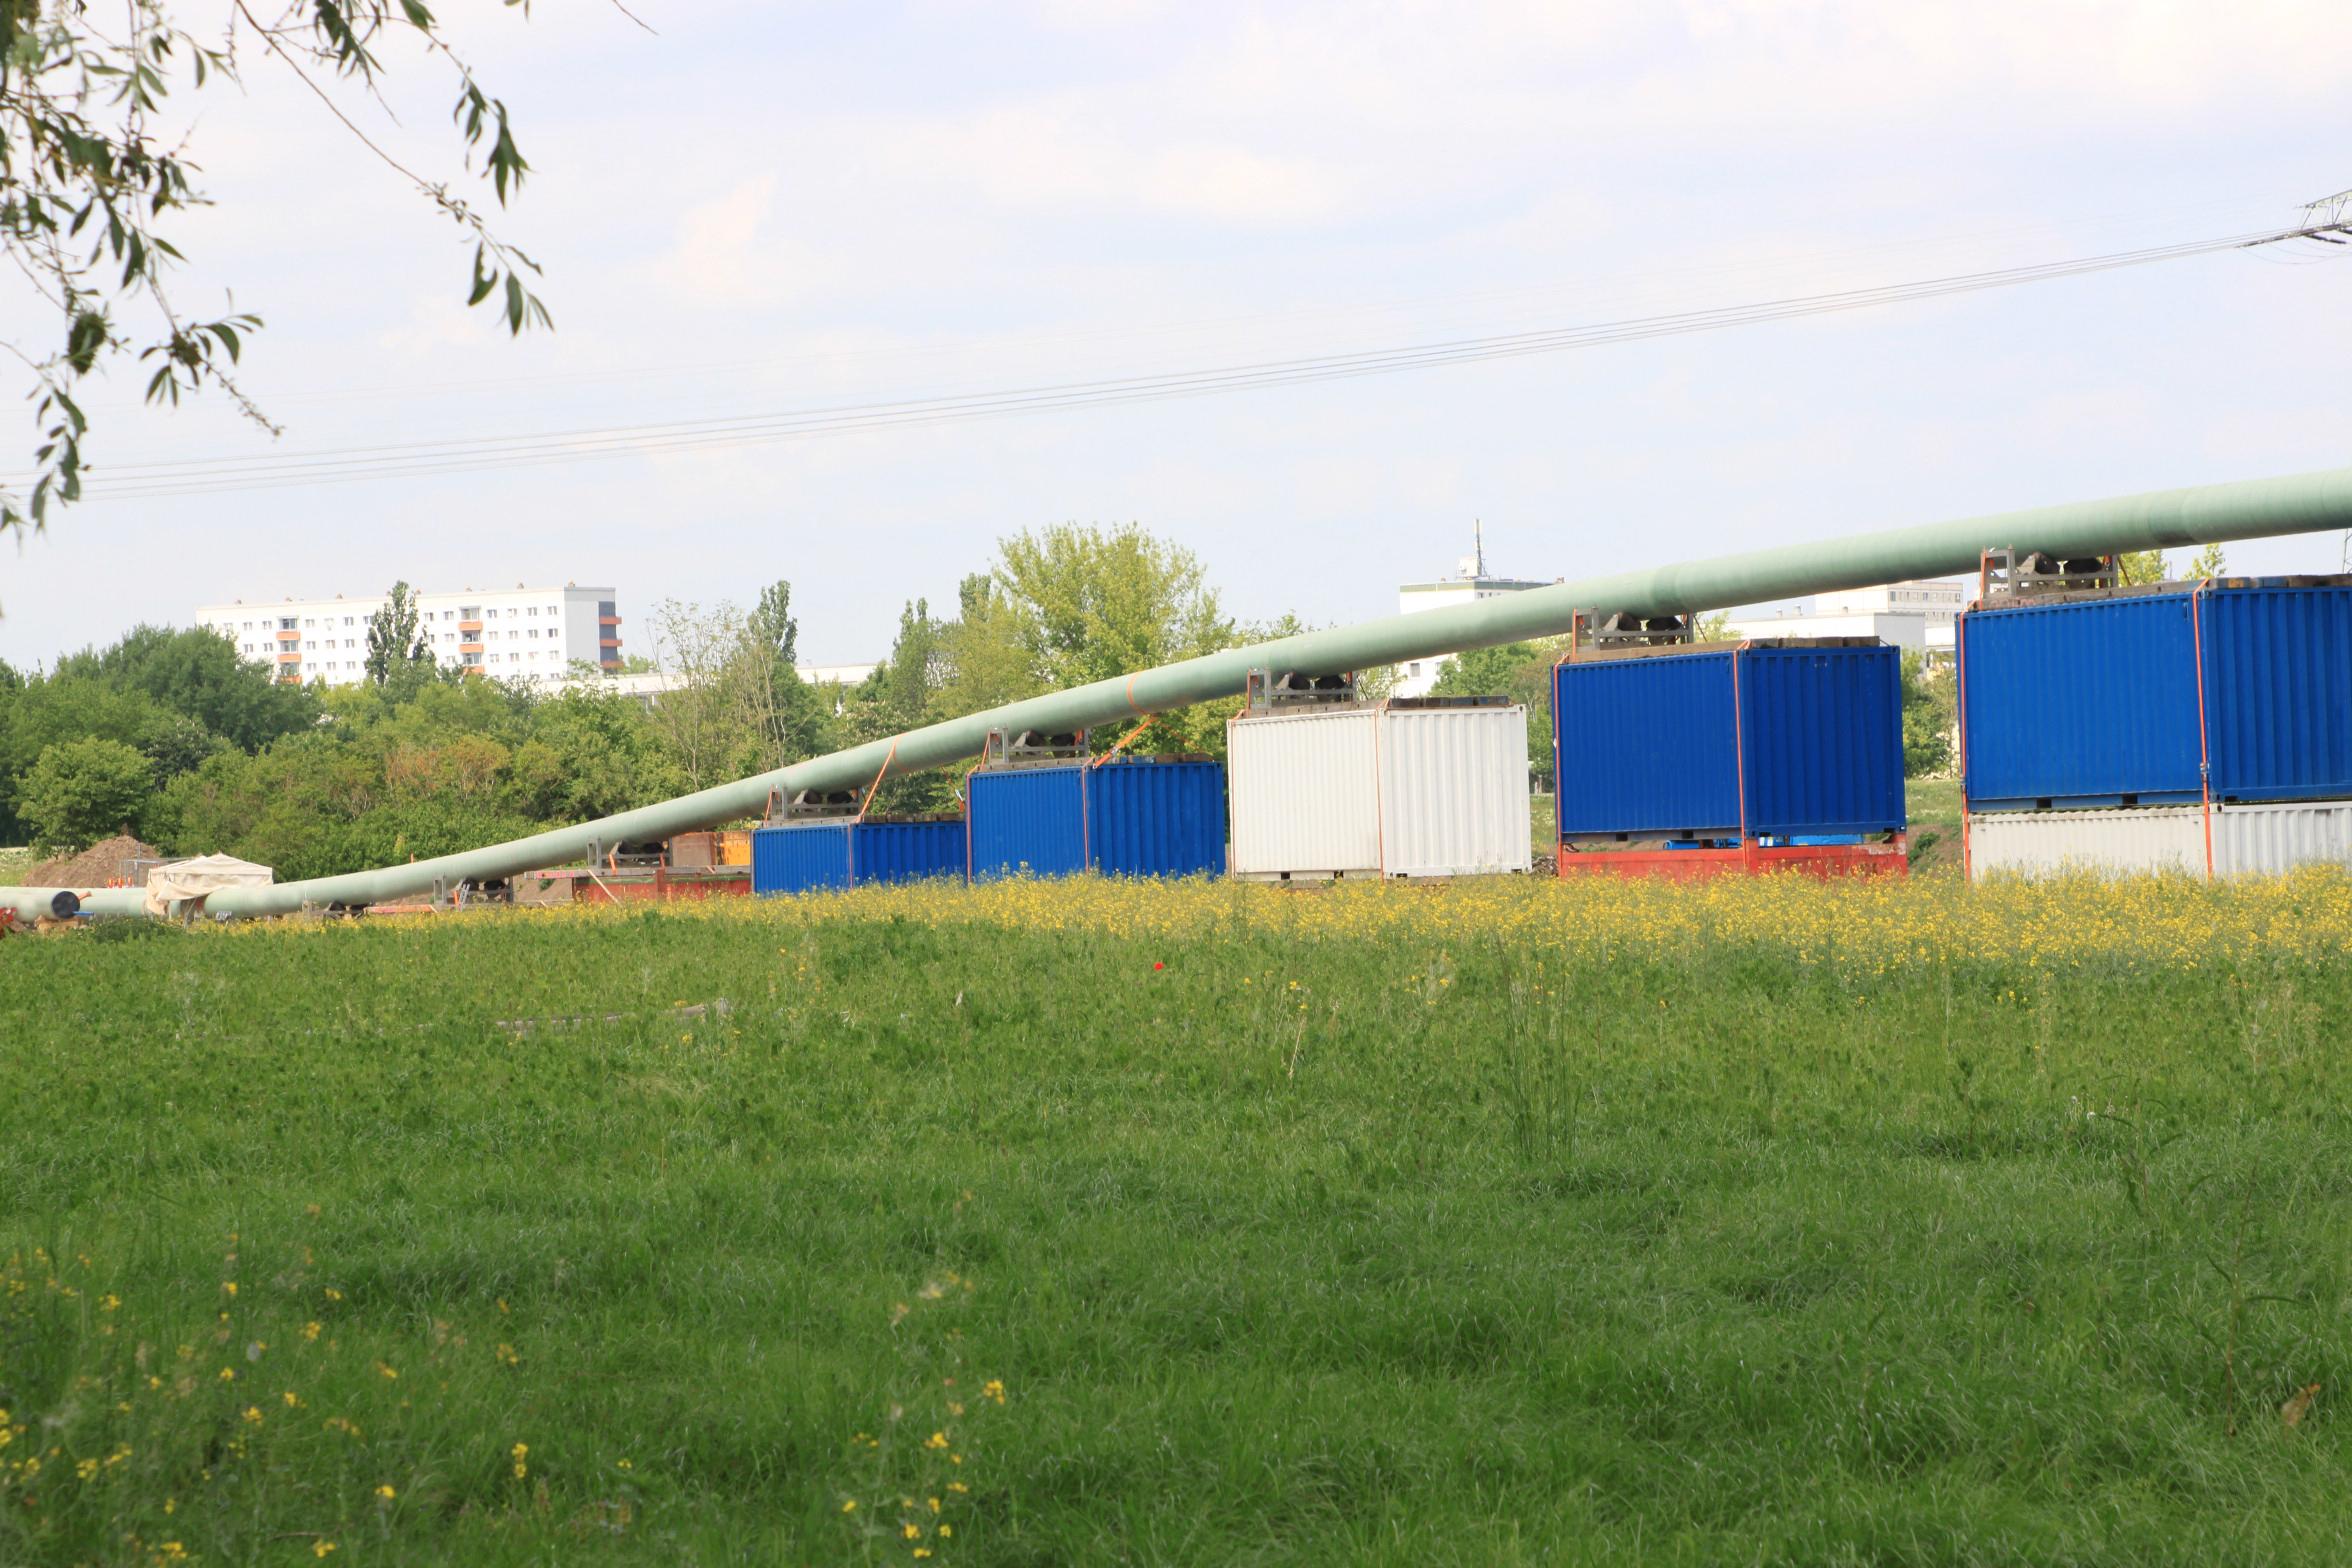 ArcelorMittal Stahlhandel GmbH & Brochier Rohrleitungsbau Nürnberg GmbH - Germany